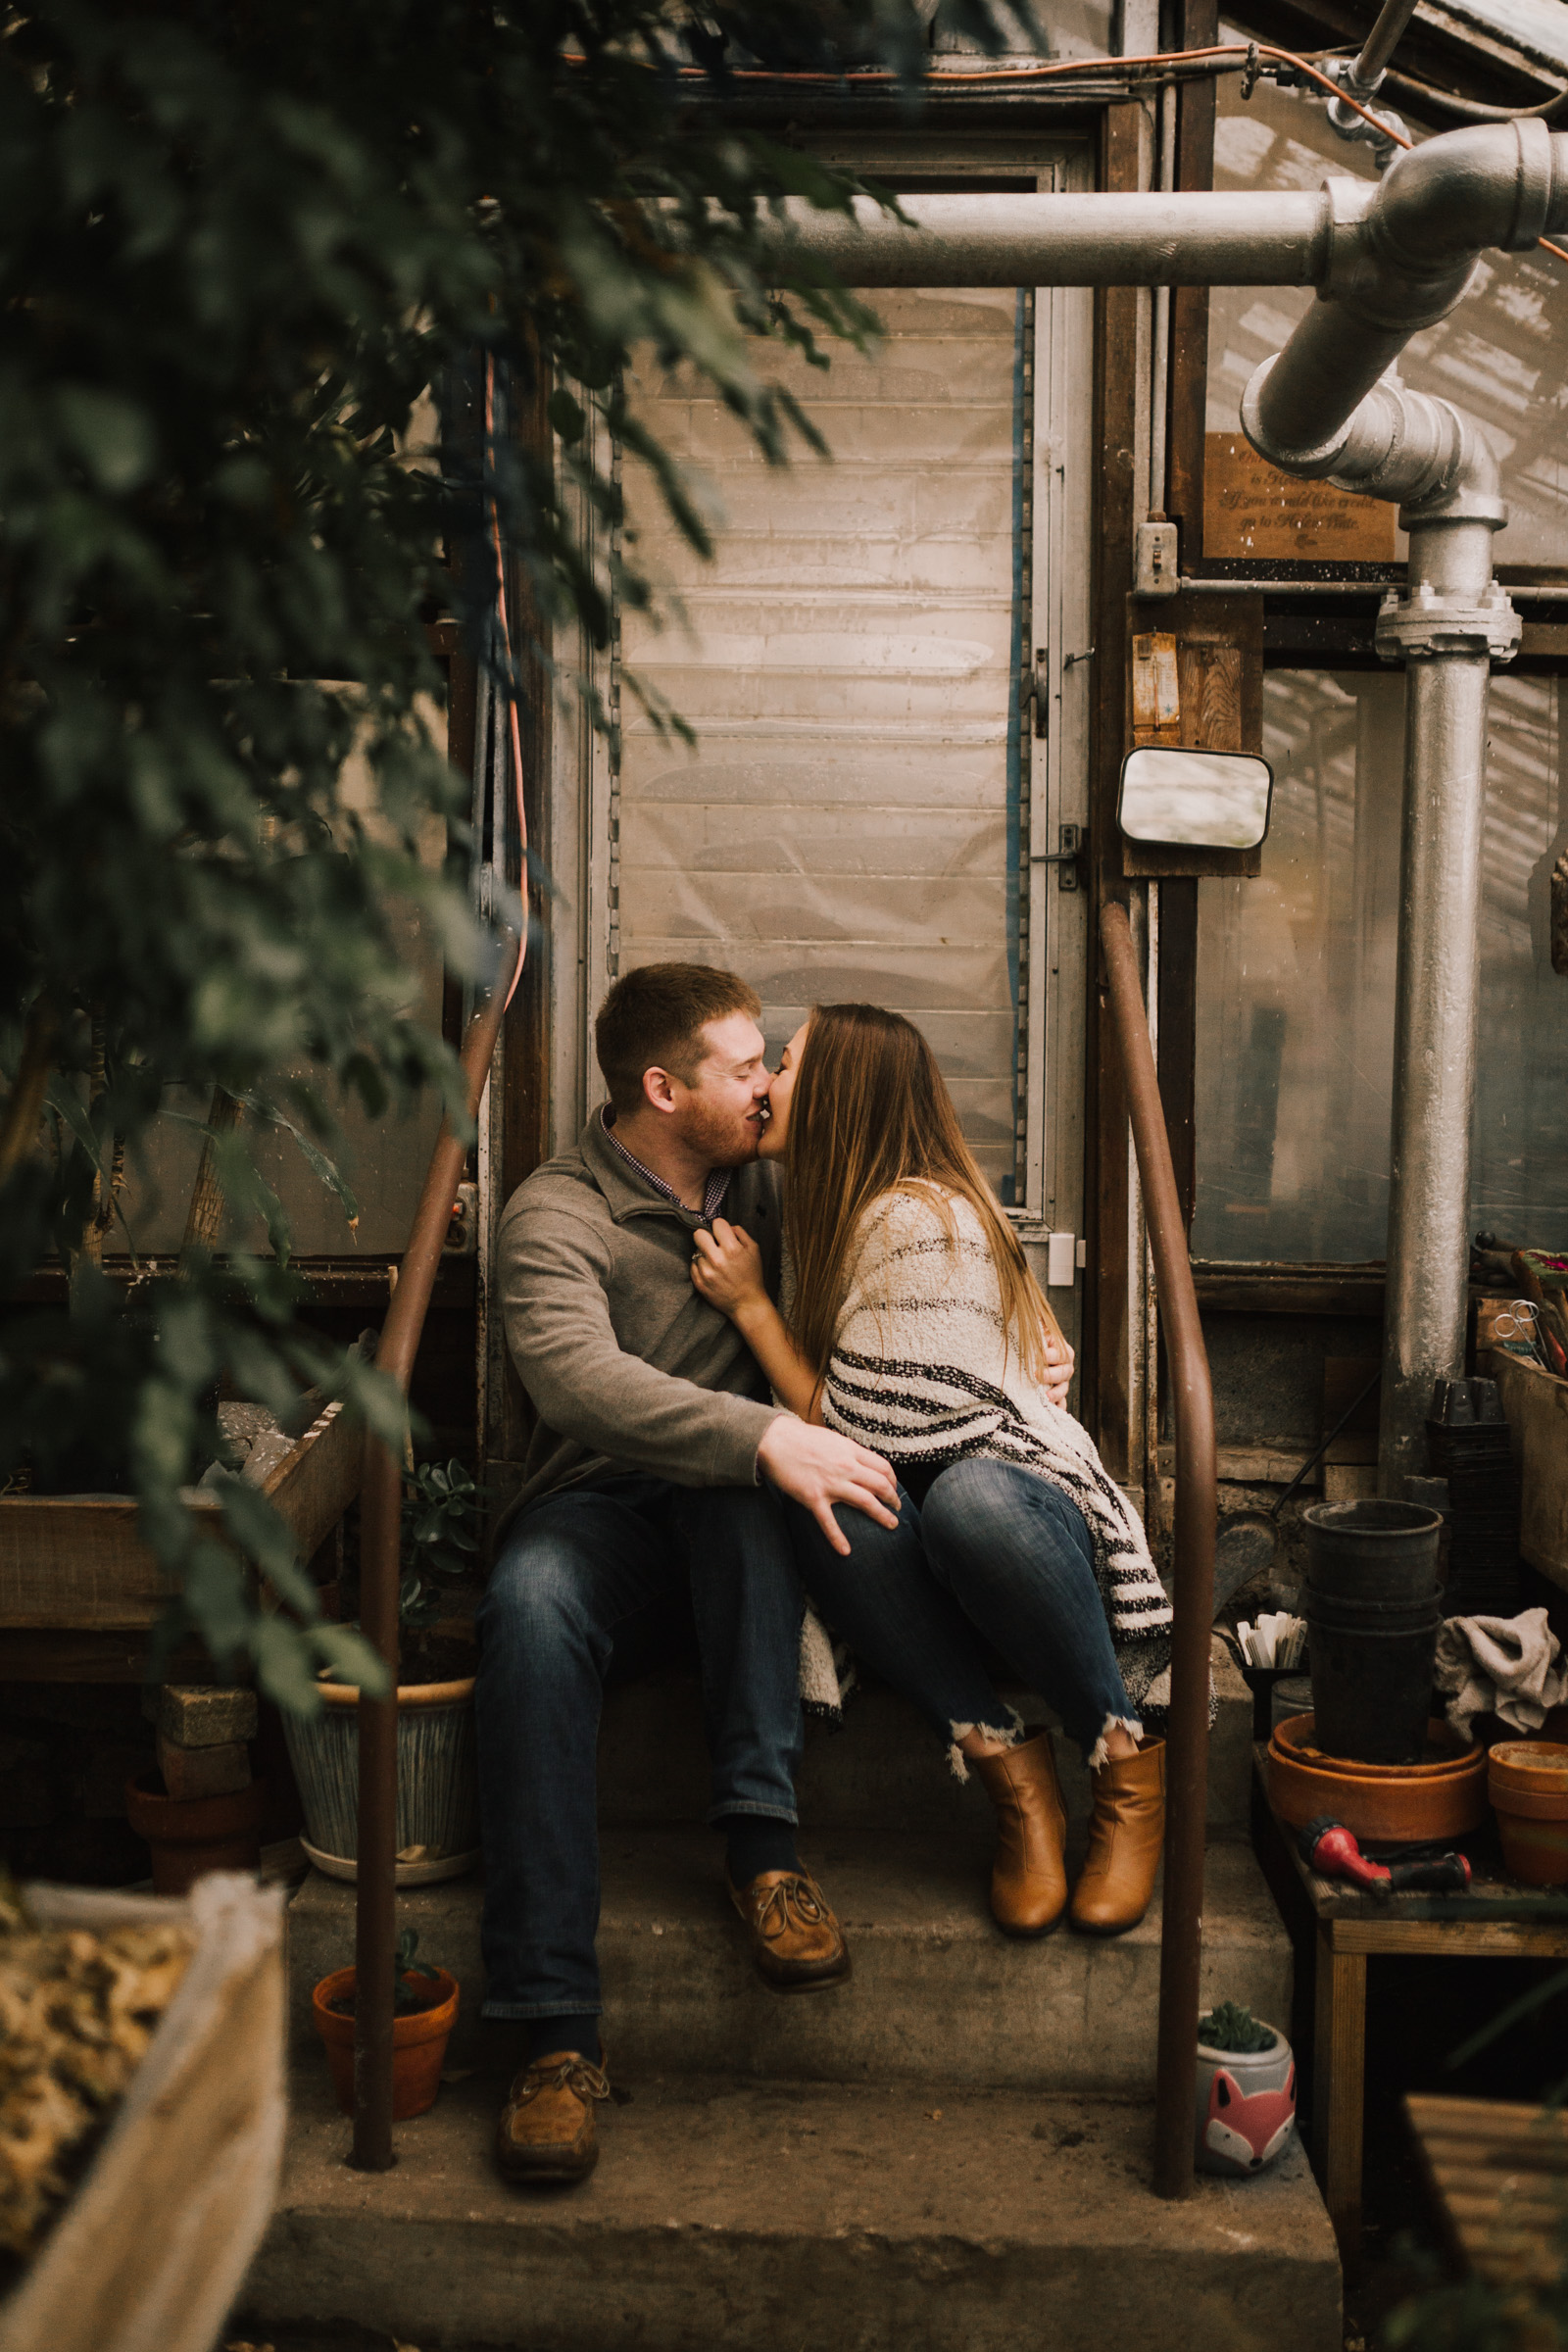 alyssa barletter photography johns greenhouse kansas city missouri brookside waldo engagement session winter-22.jpg